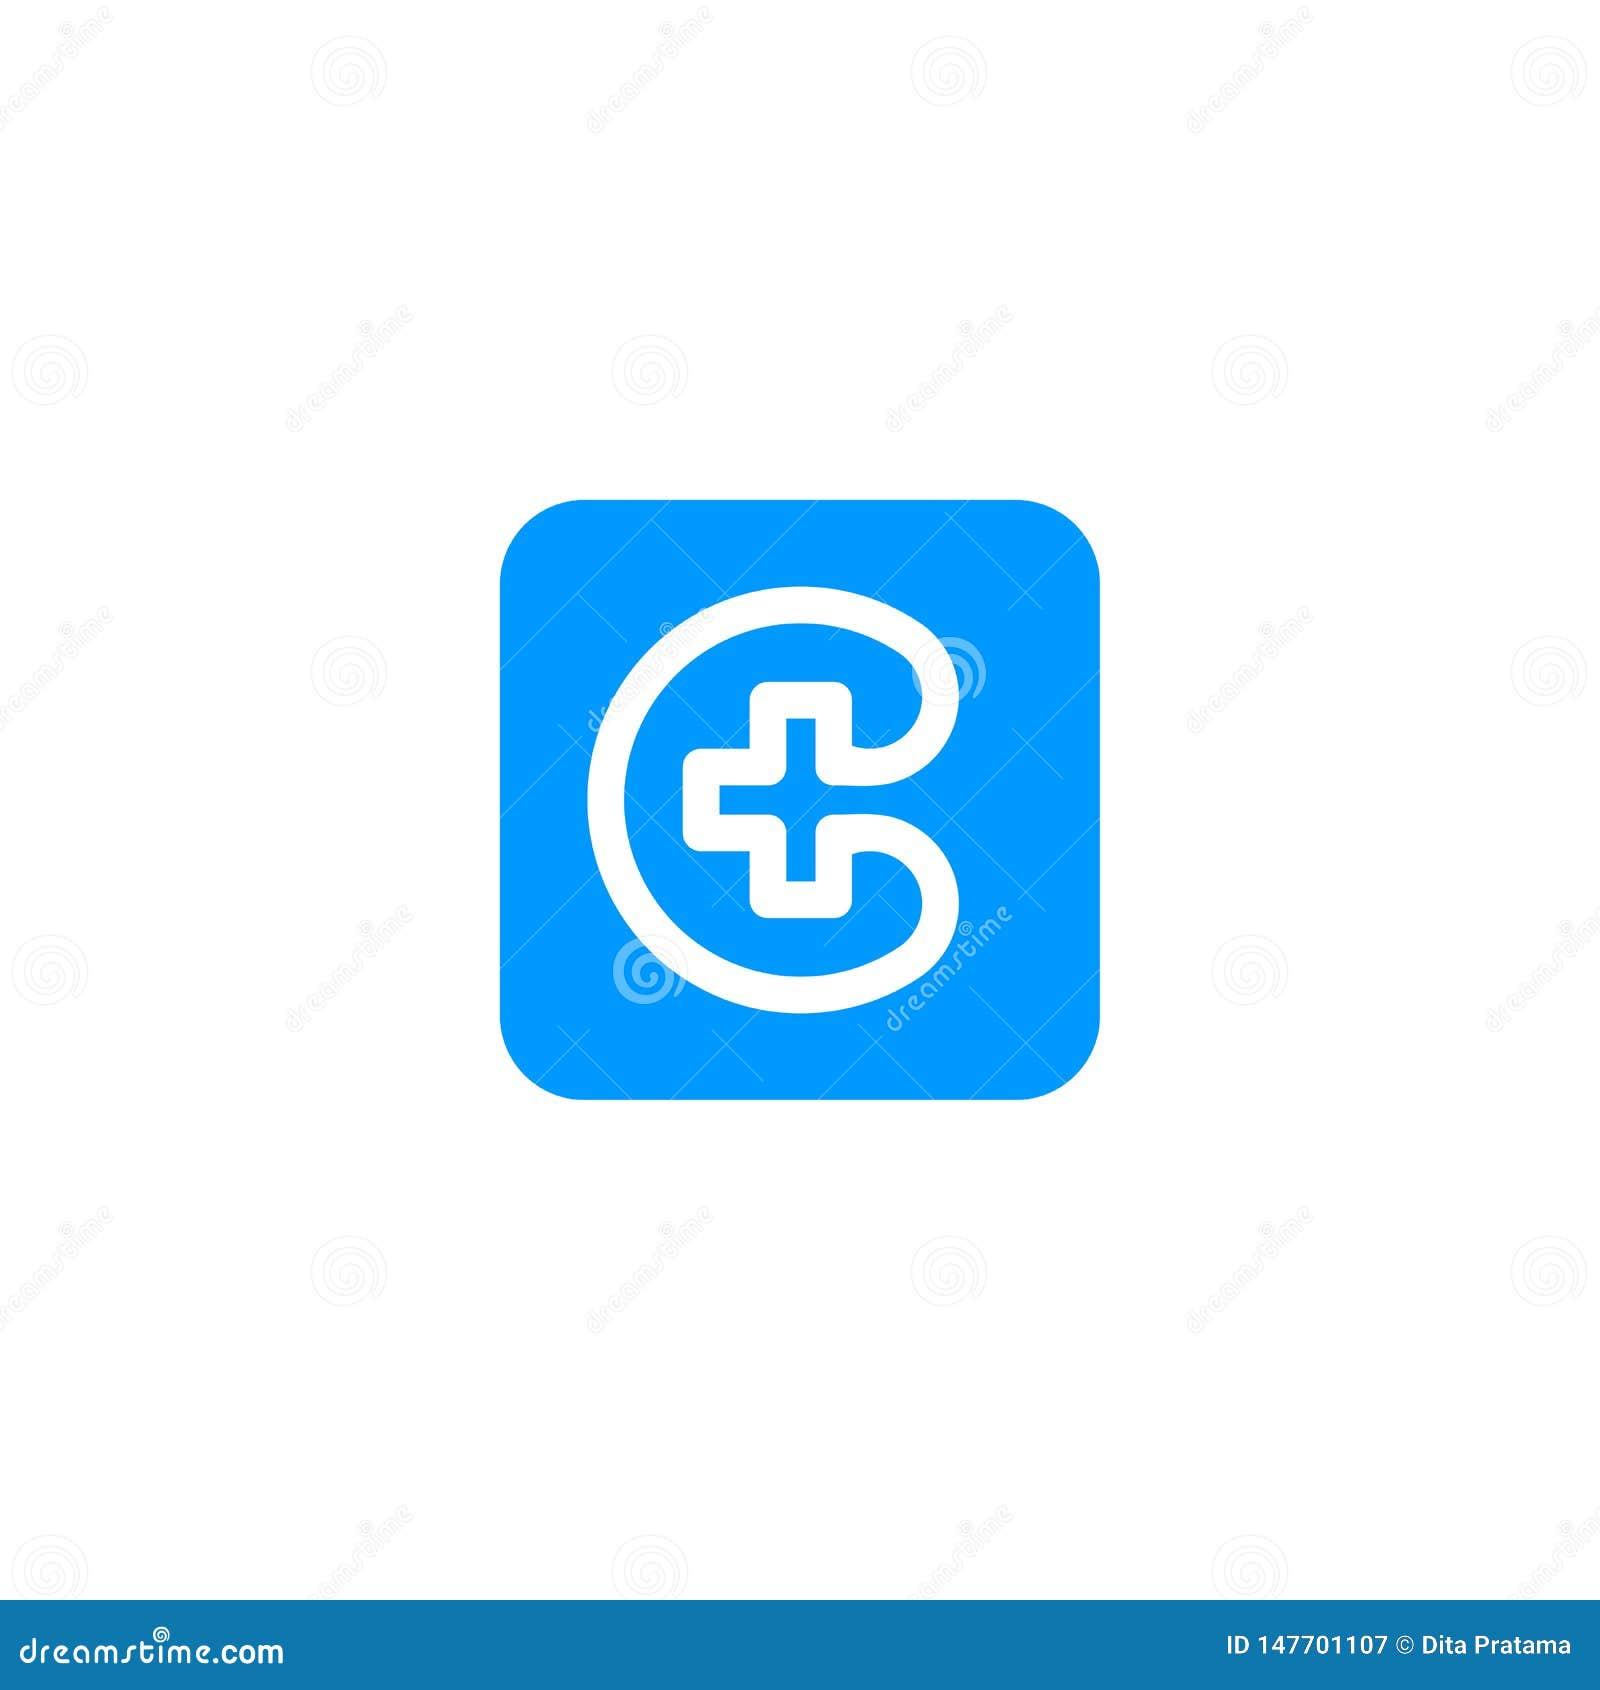 Medical telephone logo.